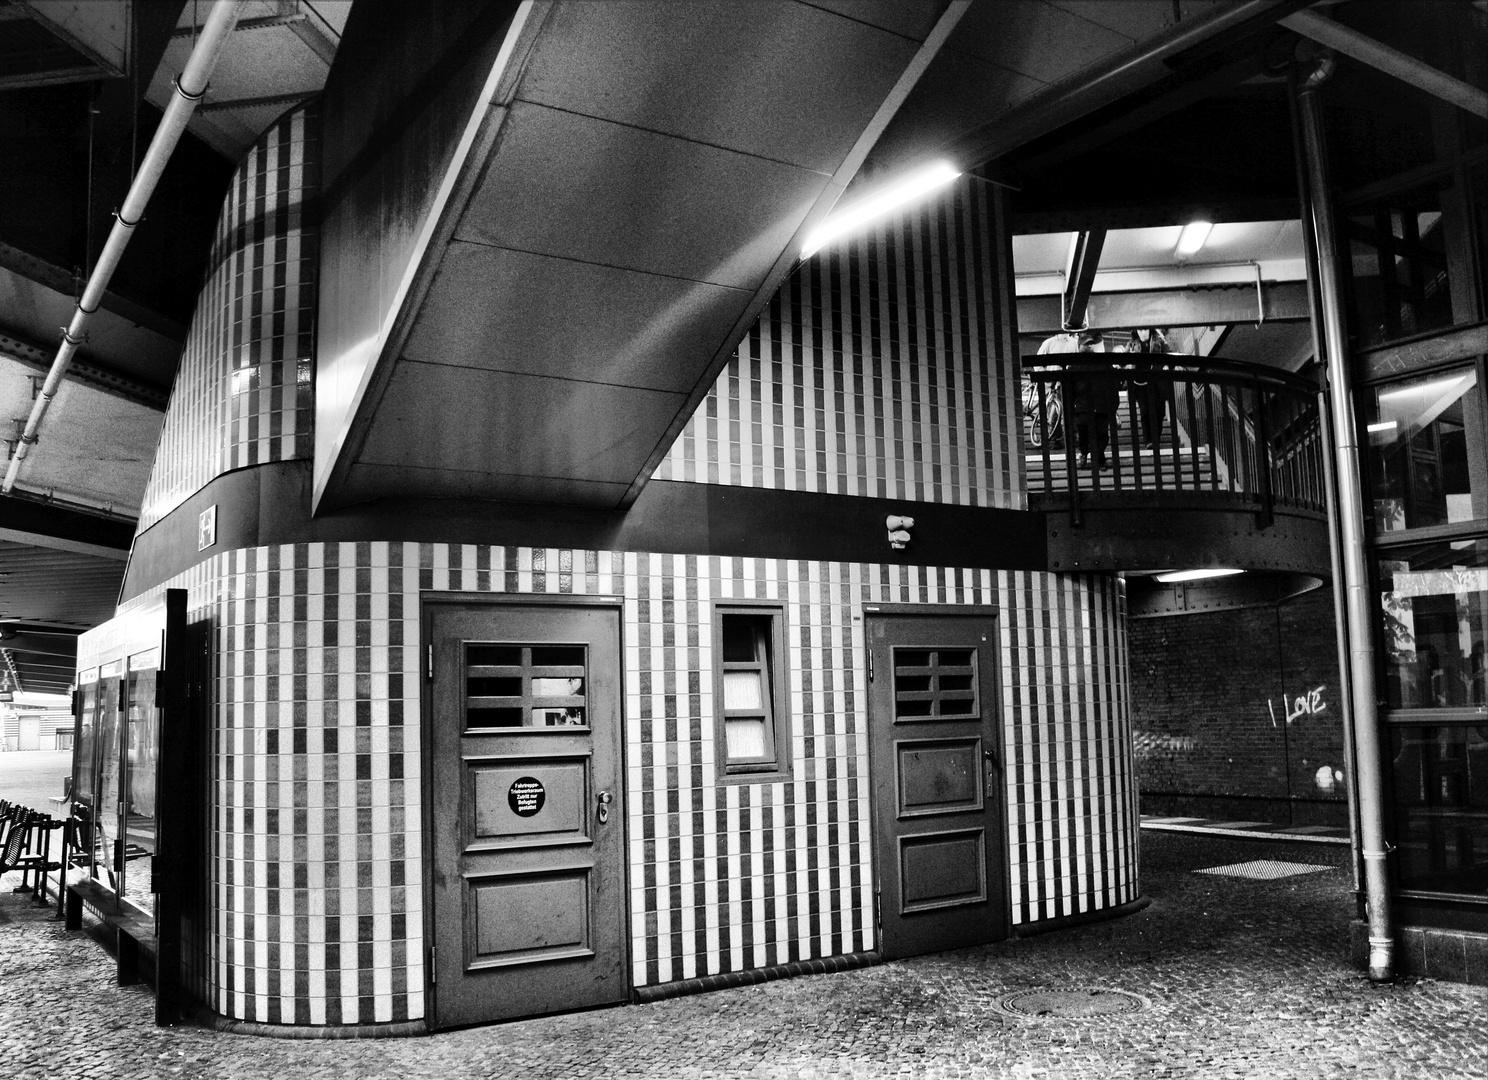 S-Bahnhof Schöneberg